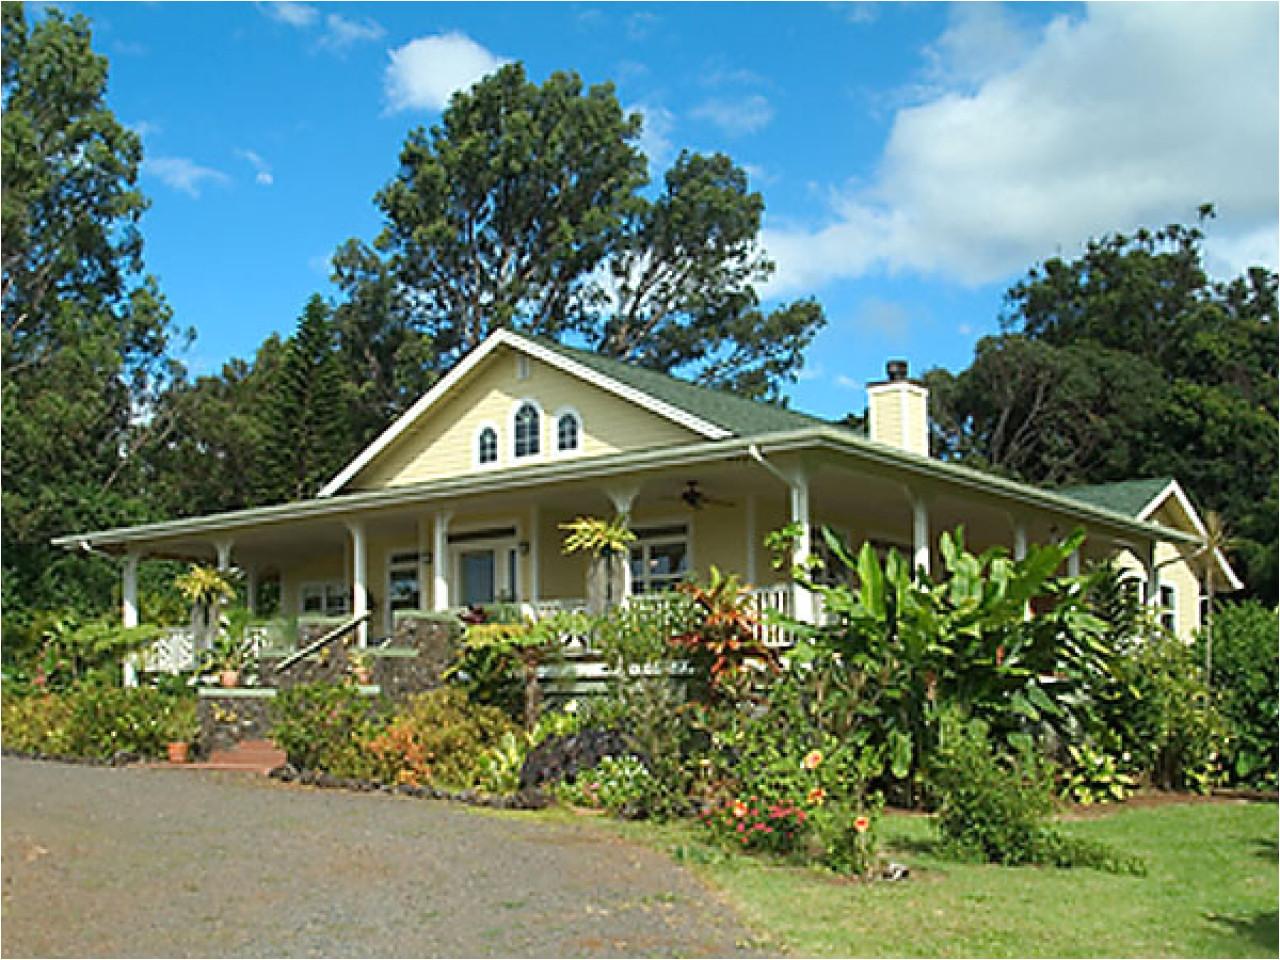 08727c153fcb300a hawaiian plantation style home kitchens hawaiian plantation style home